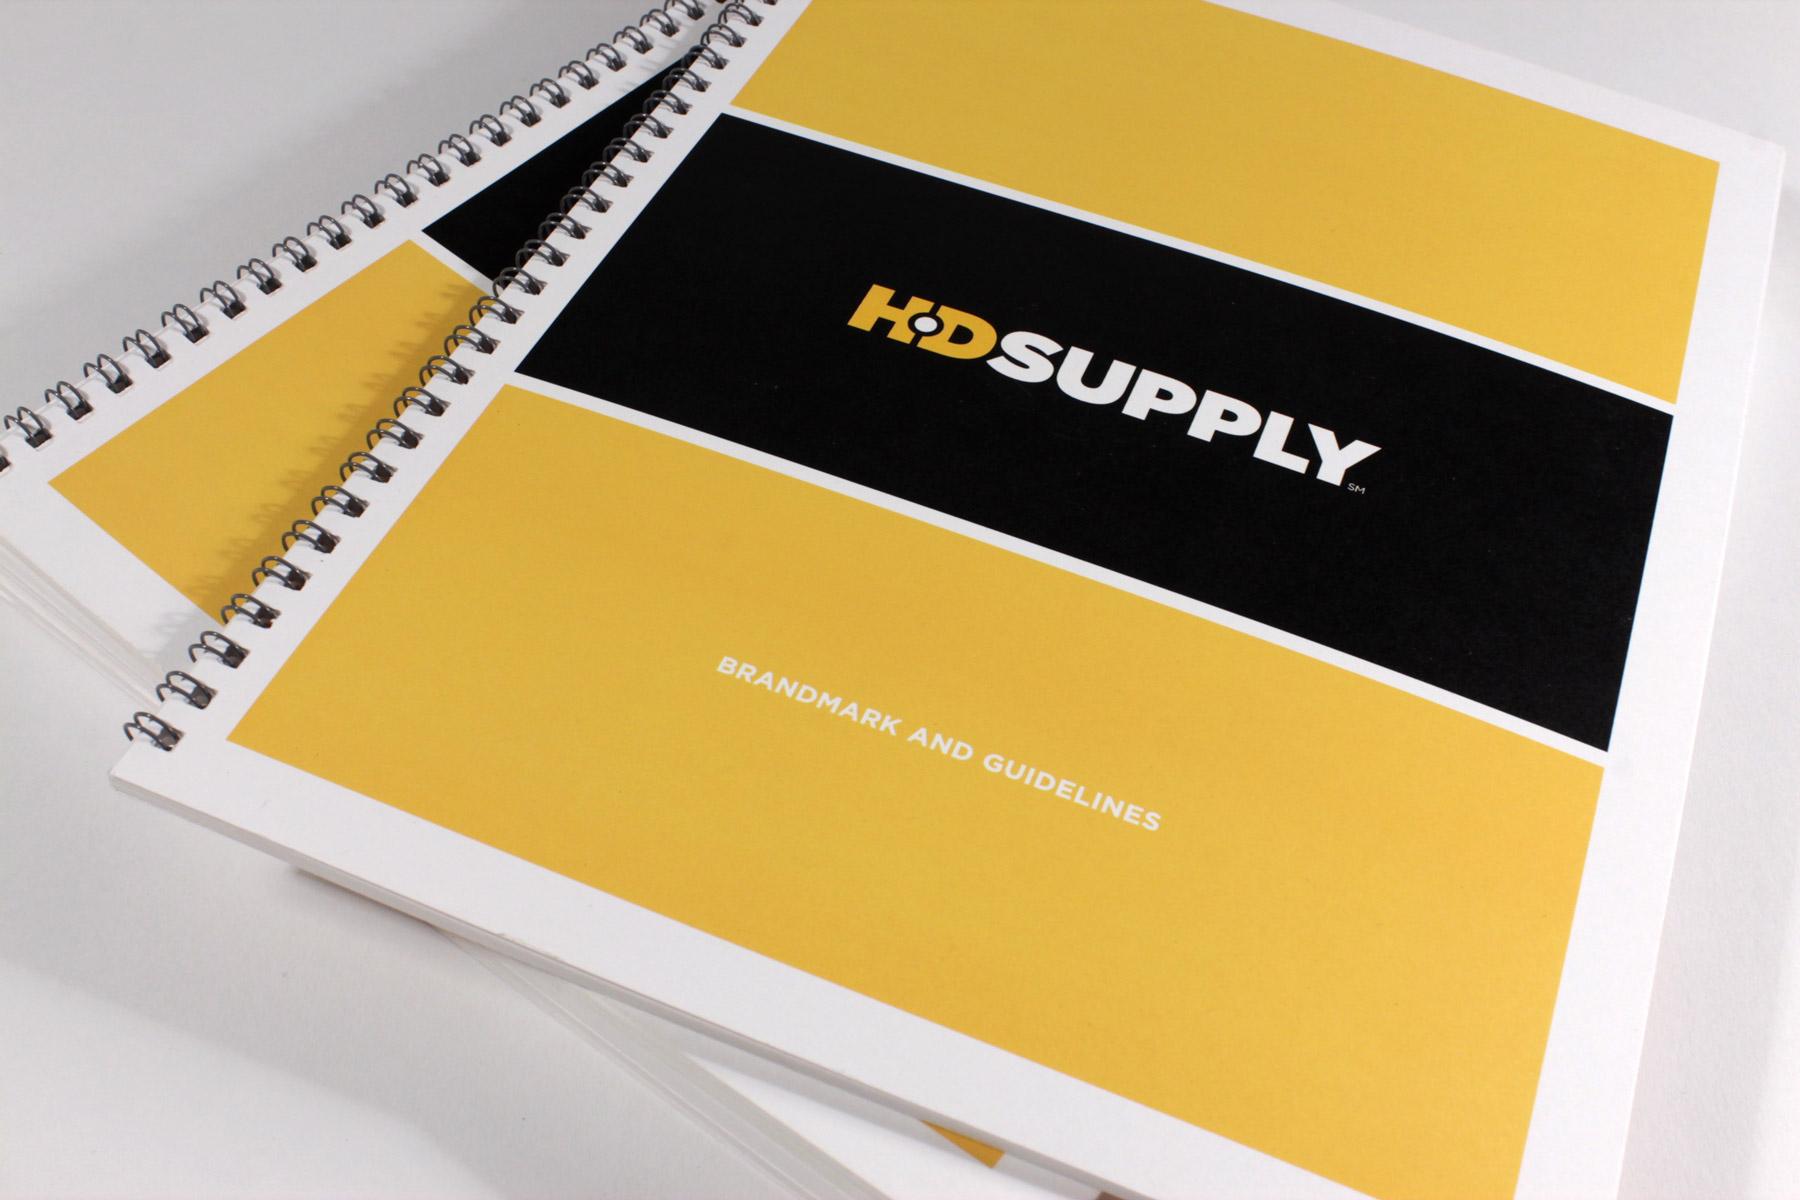 HD Supply Brand Book